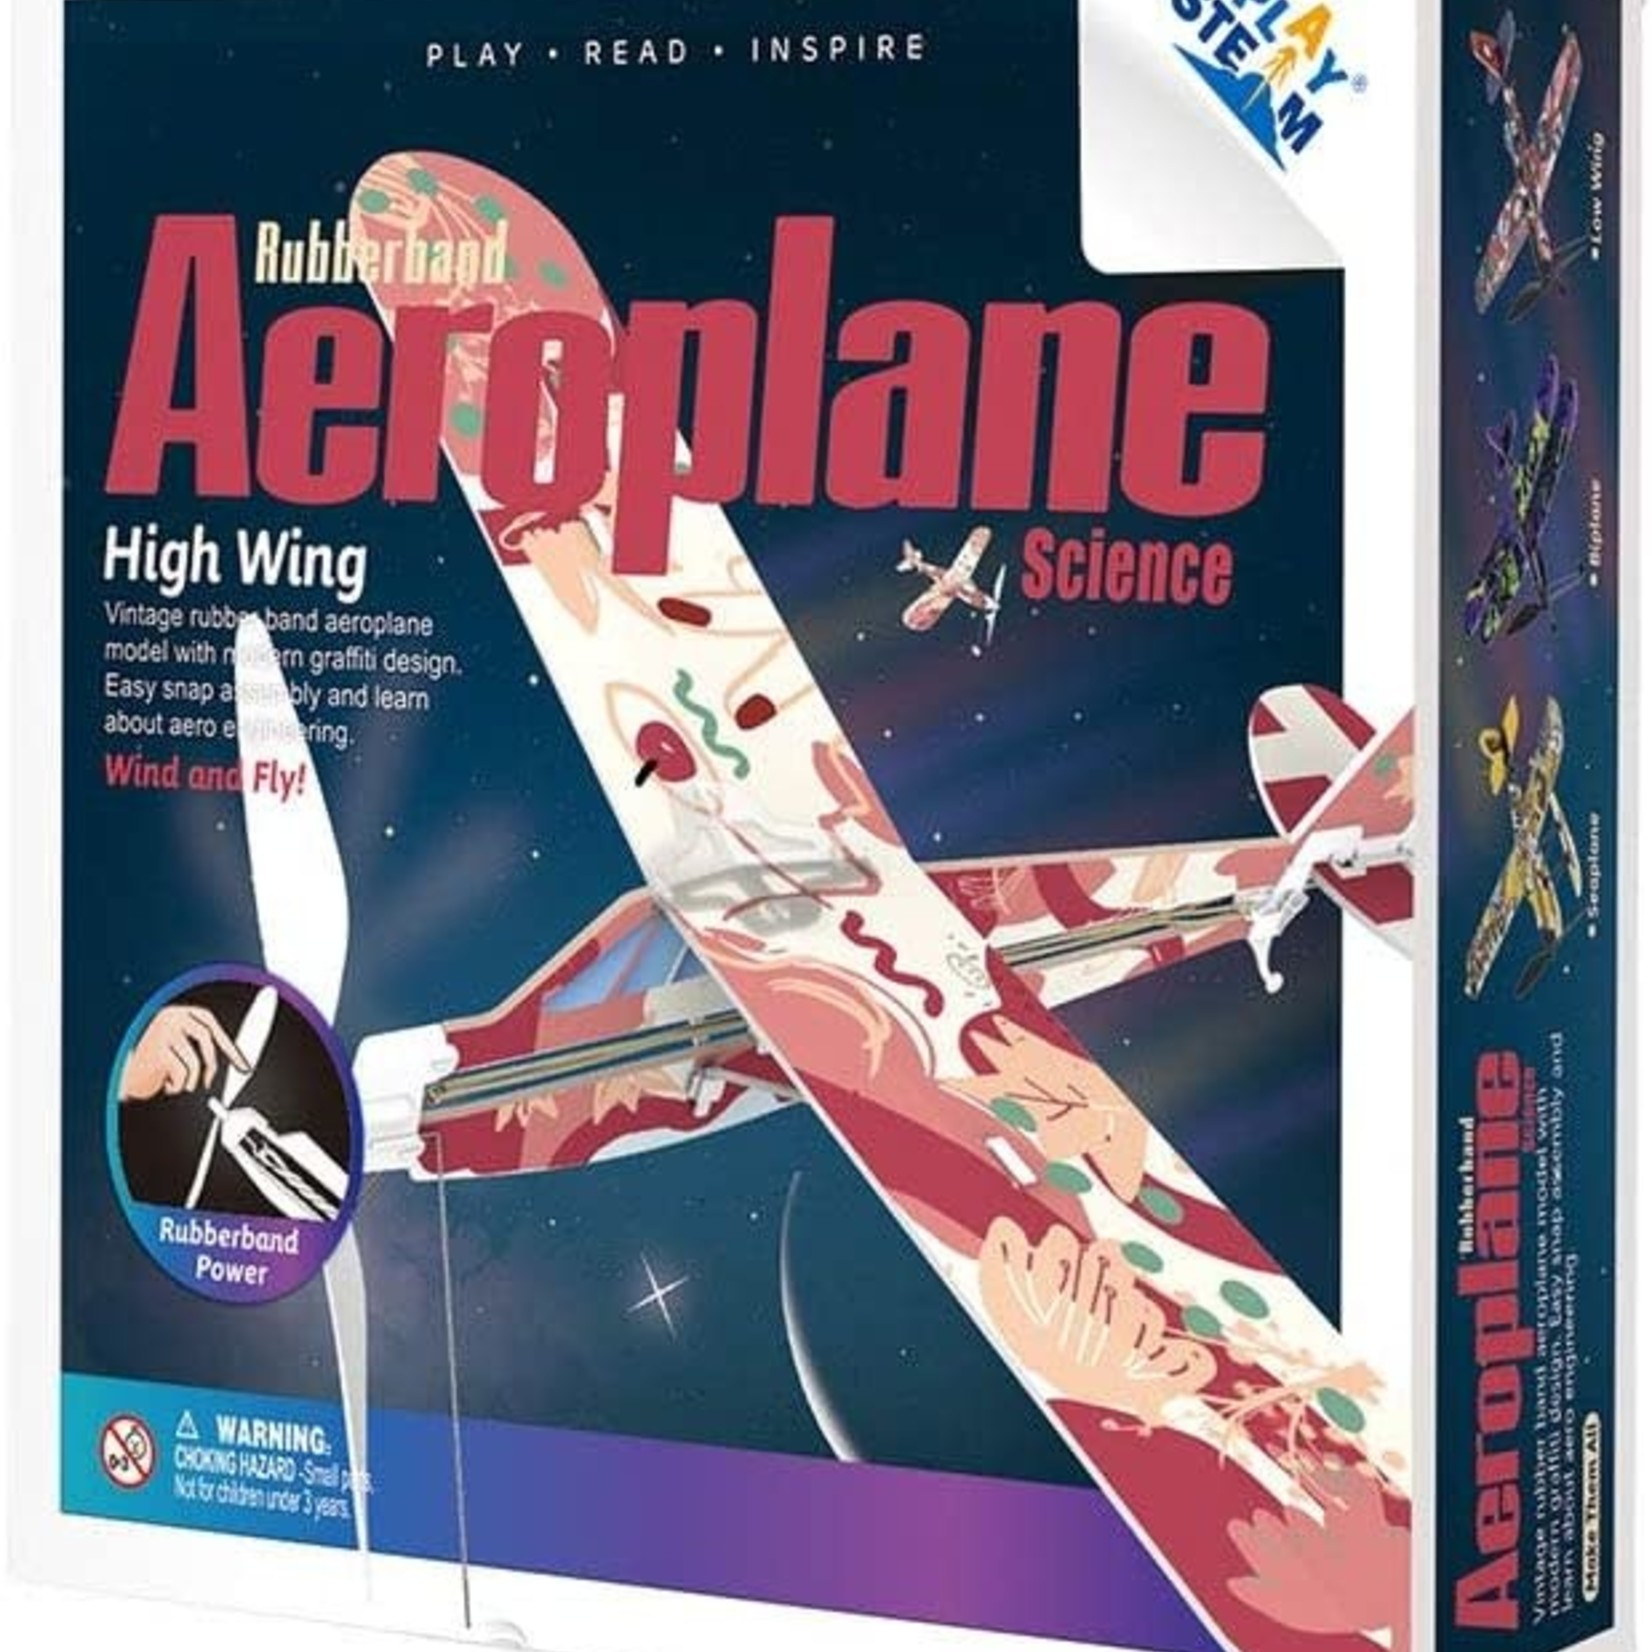 Play Steam Rubberband Aeroplane Science